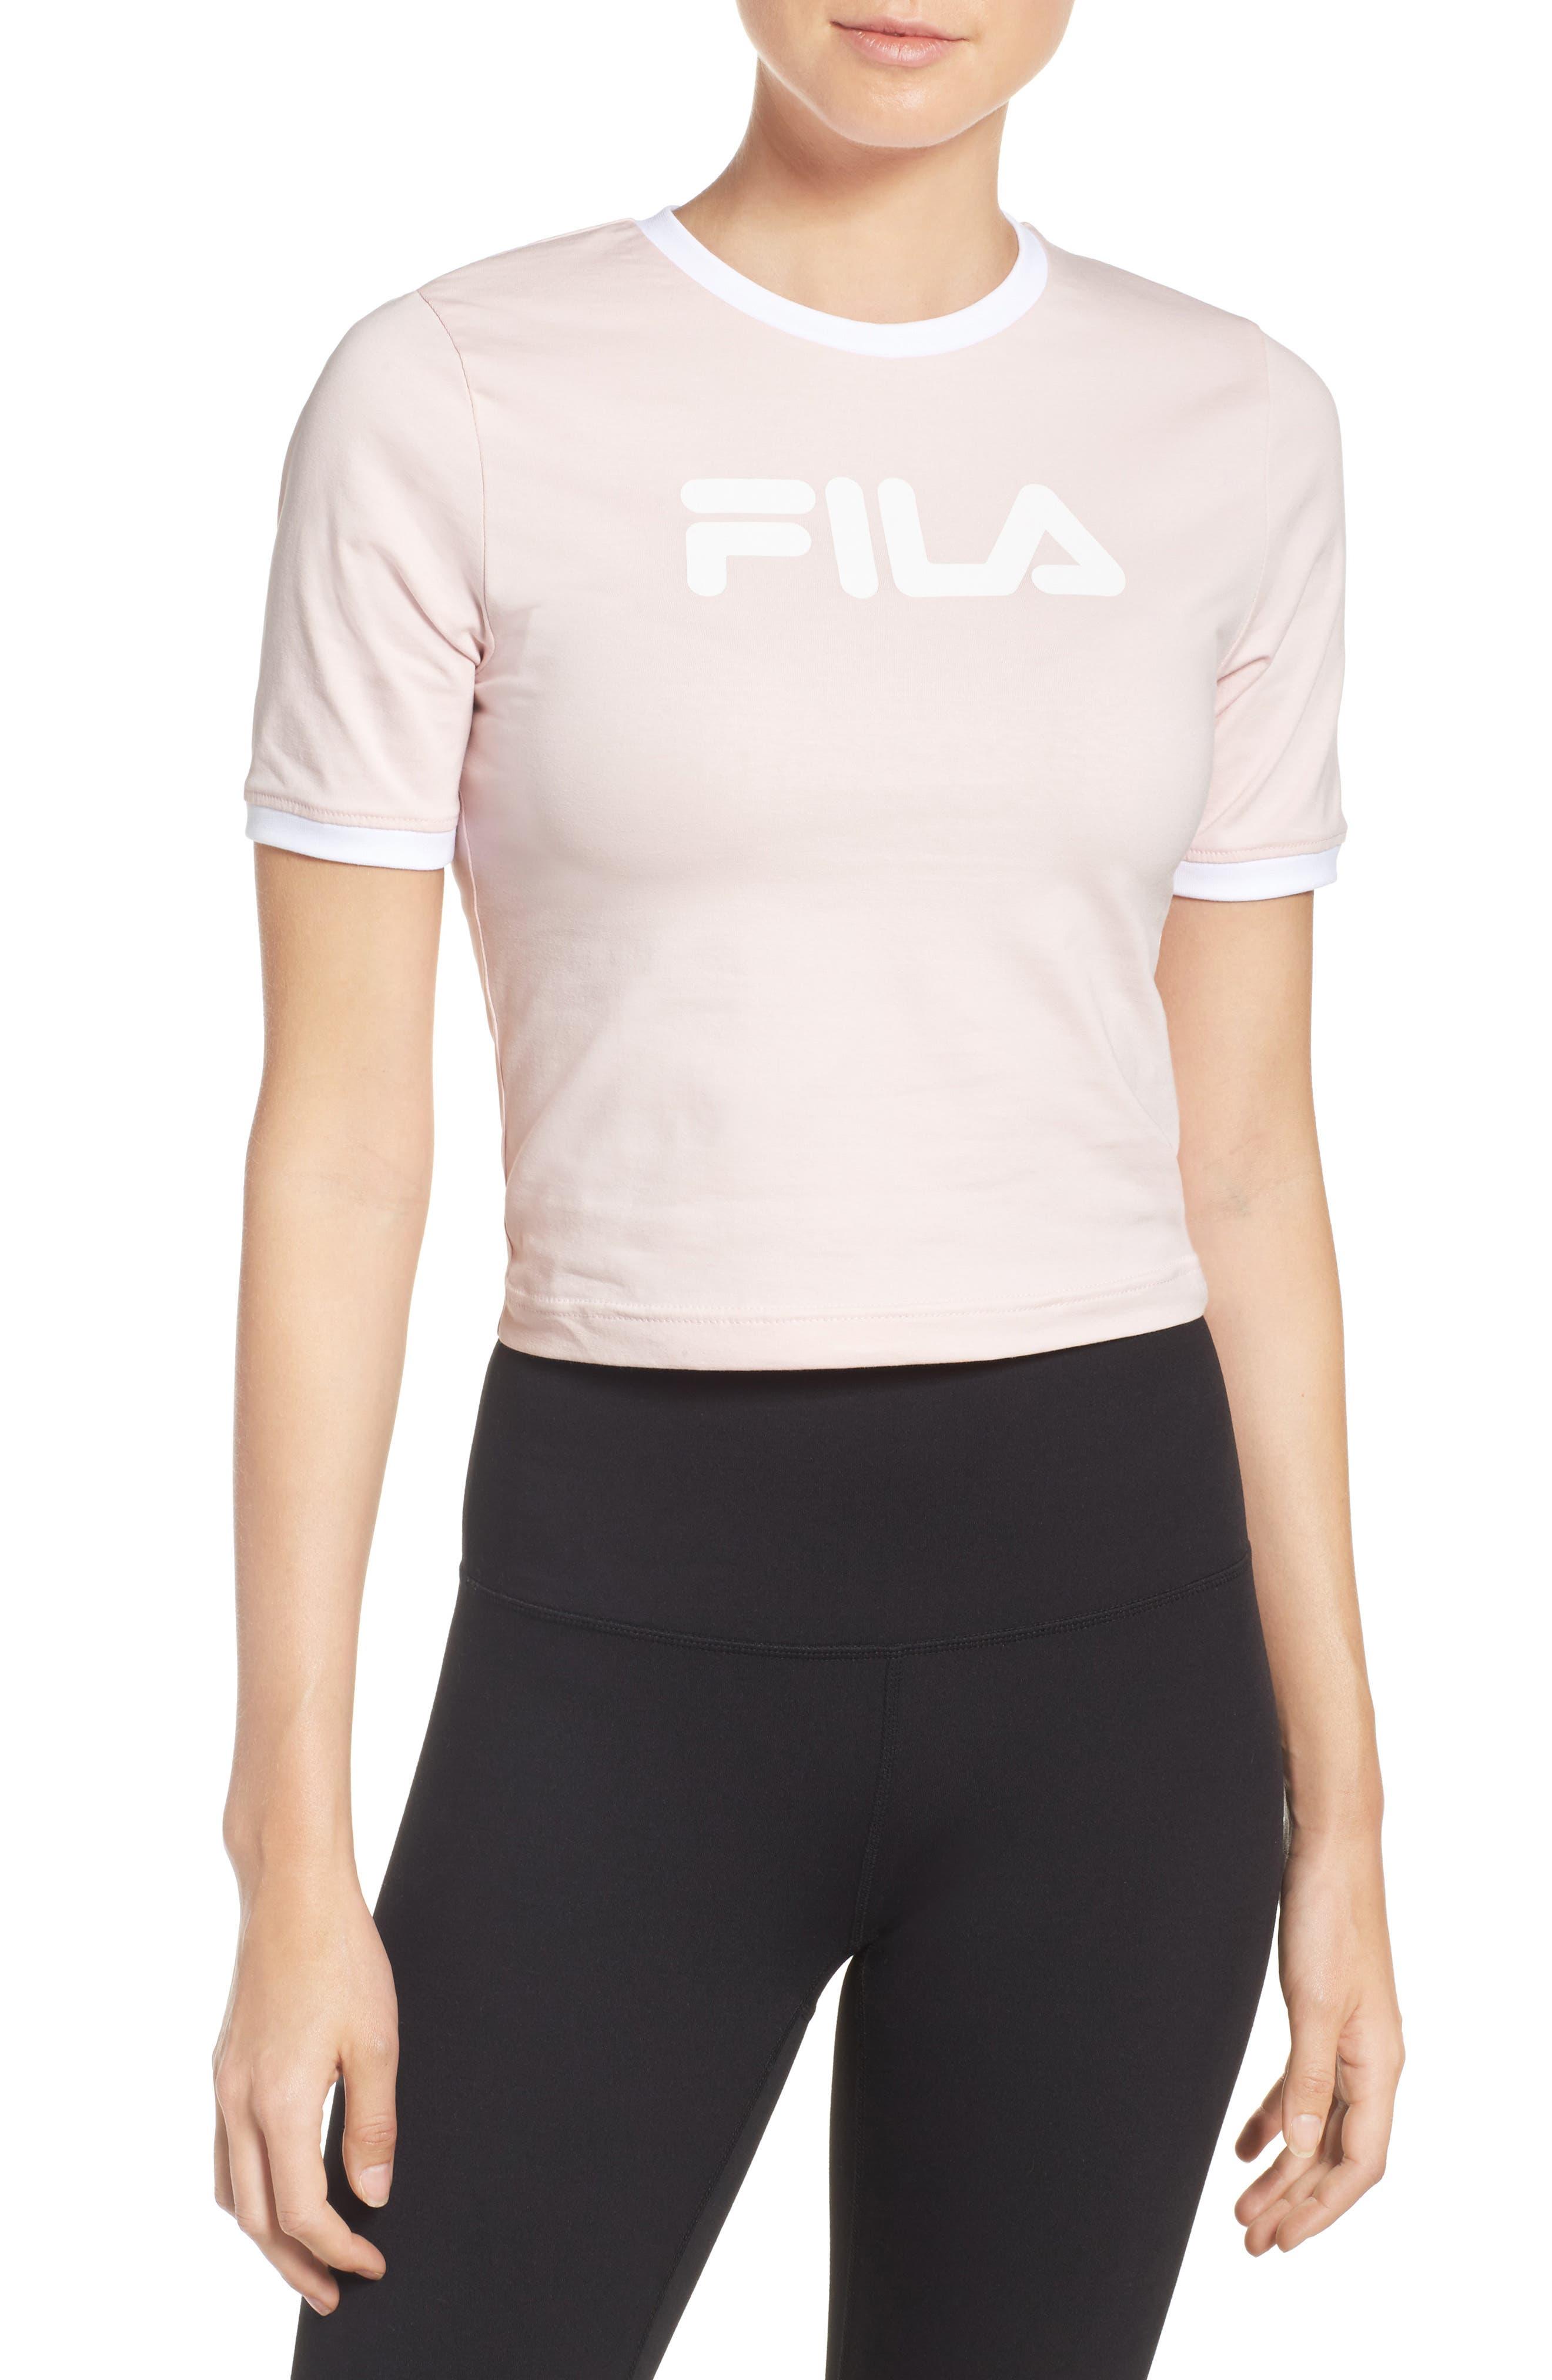 FILA Tionne Logo Crop Tee